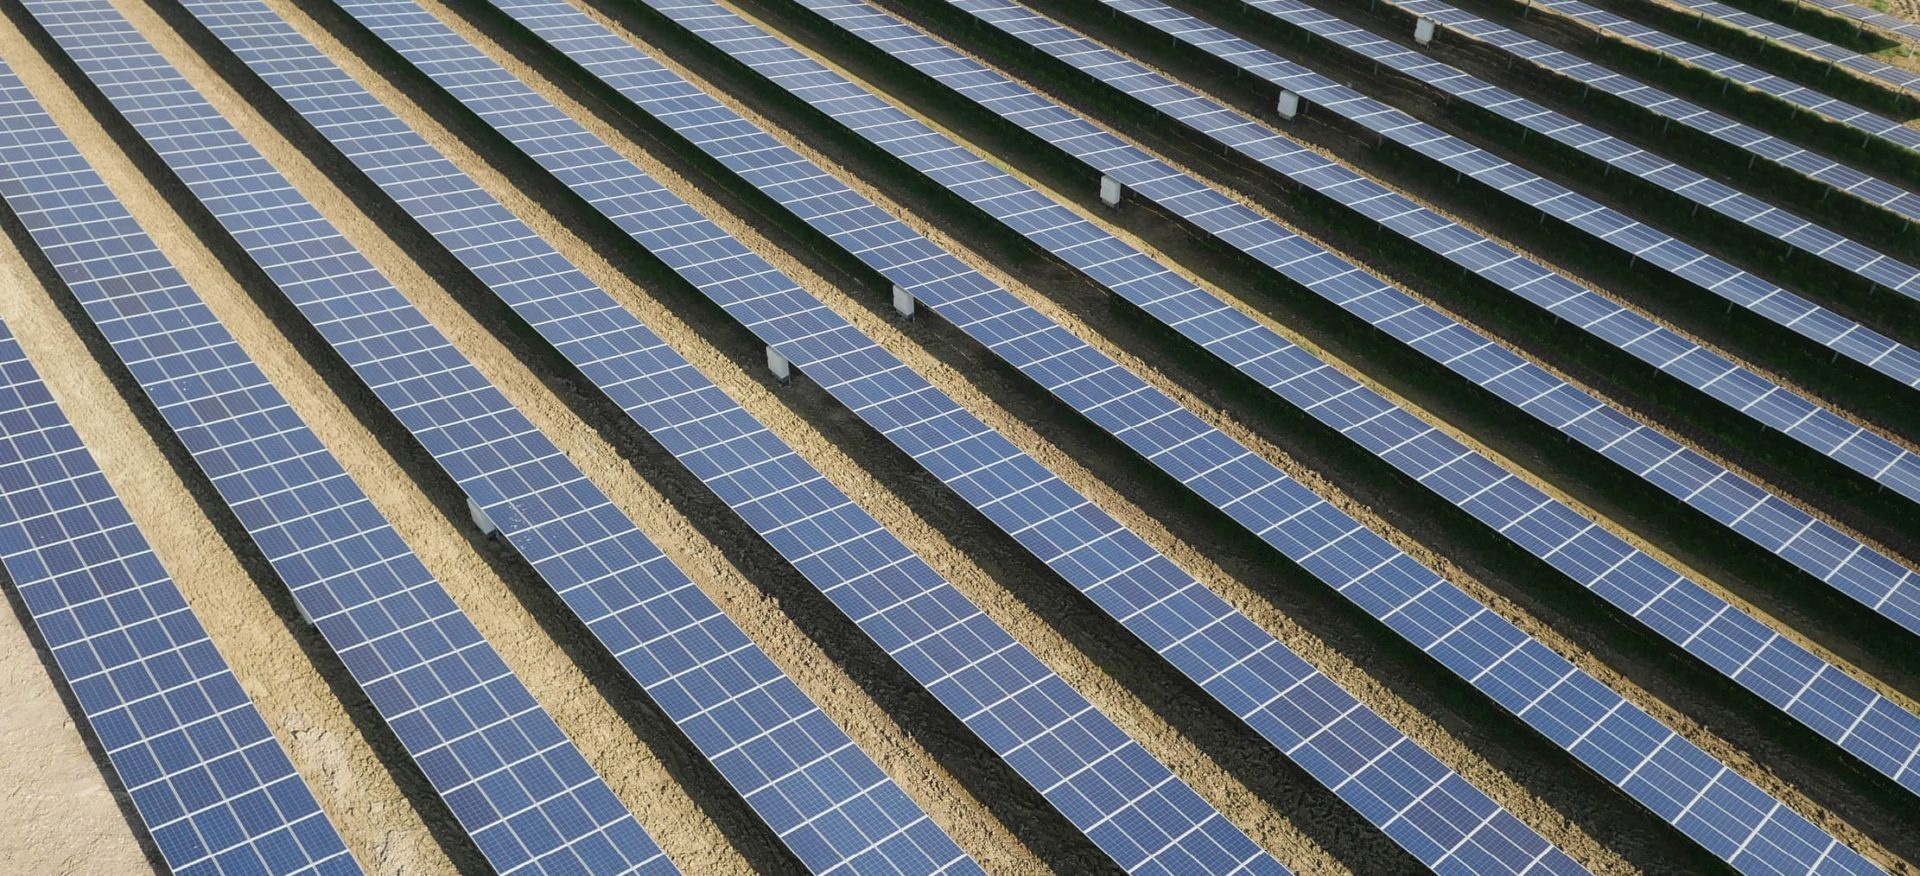 Solaranlage Sandridge in Melksham, United Kingdom